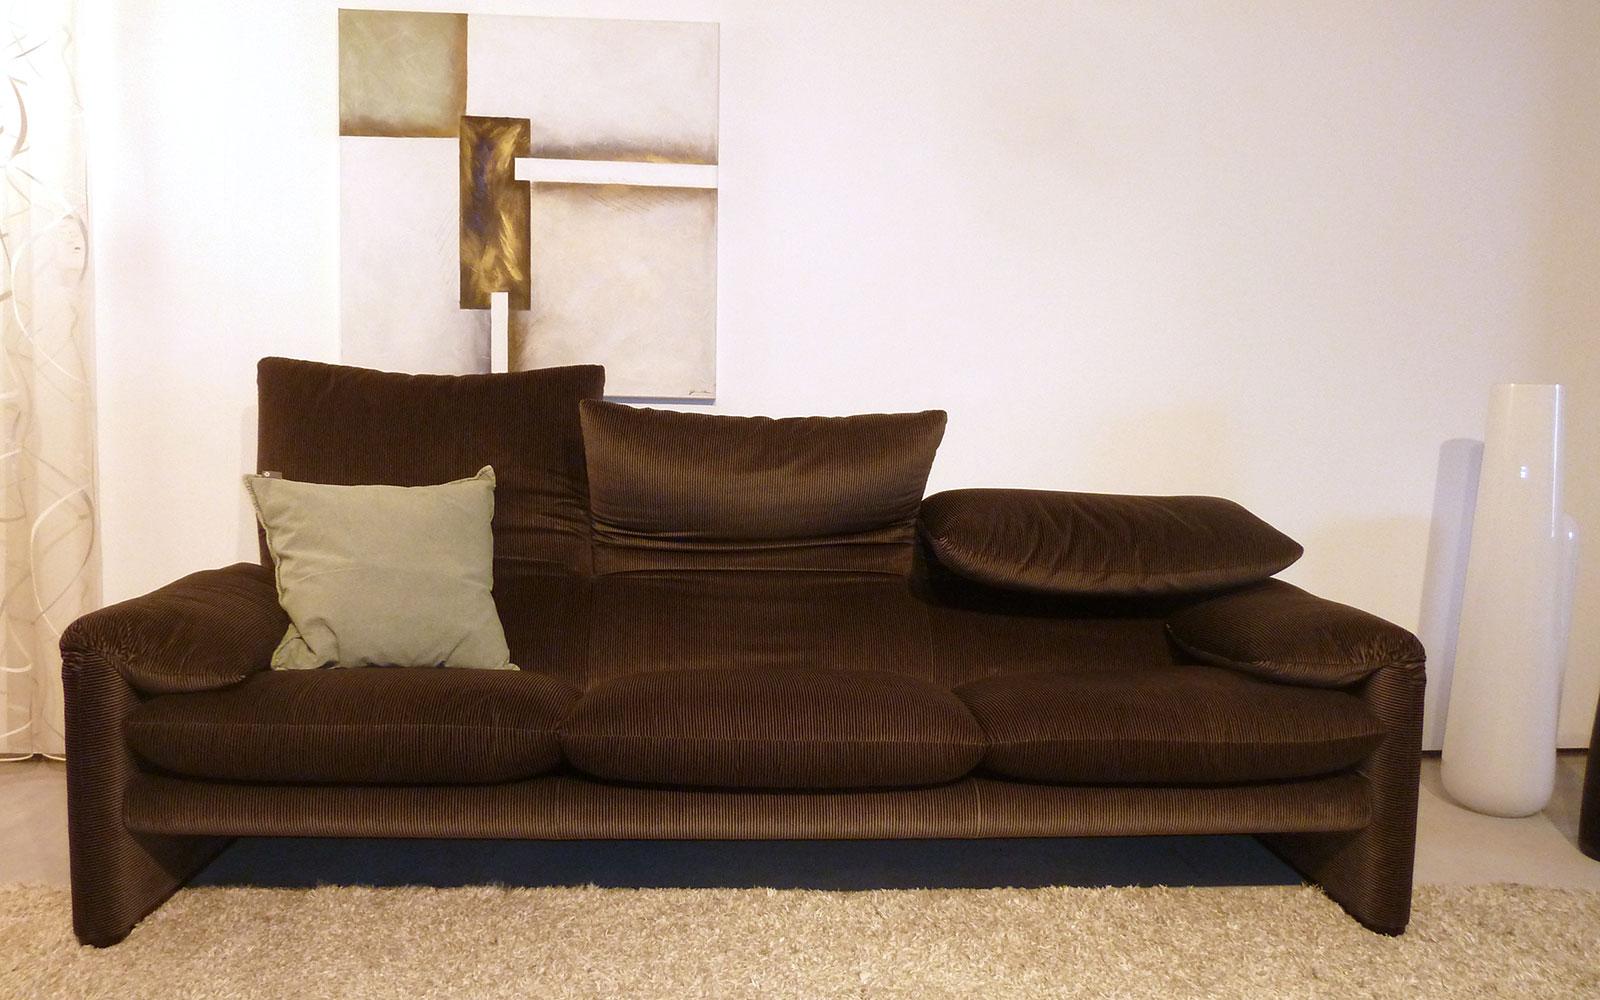 Full Size of Cassina Miloe Sofa Aspen Moov Furniture Sale Maralunga Covers Otto Toot For 8 Met Mister Gebraucht Nest 2 Sitzer Mit Schlaffunktion Hersteller Big Kaufen Sofa Cassina Sofa